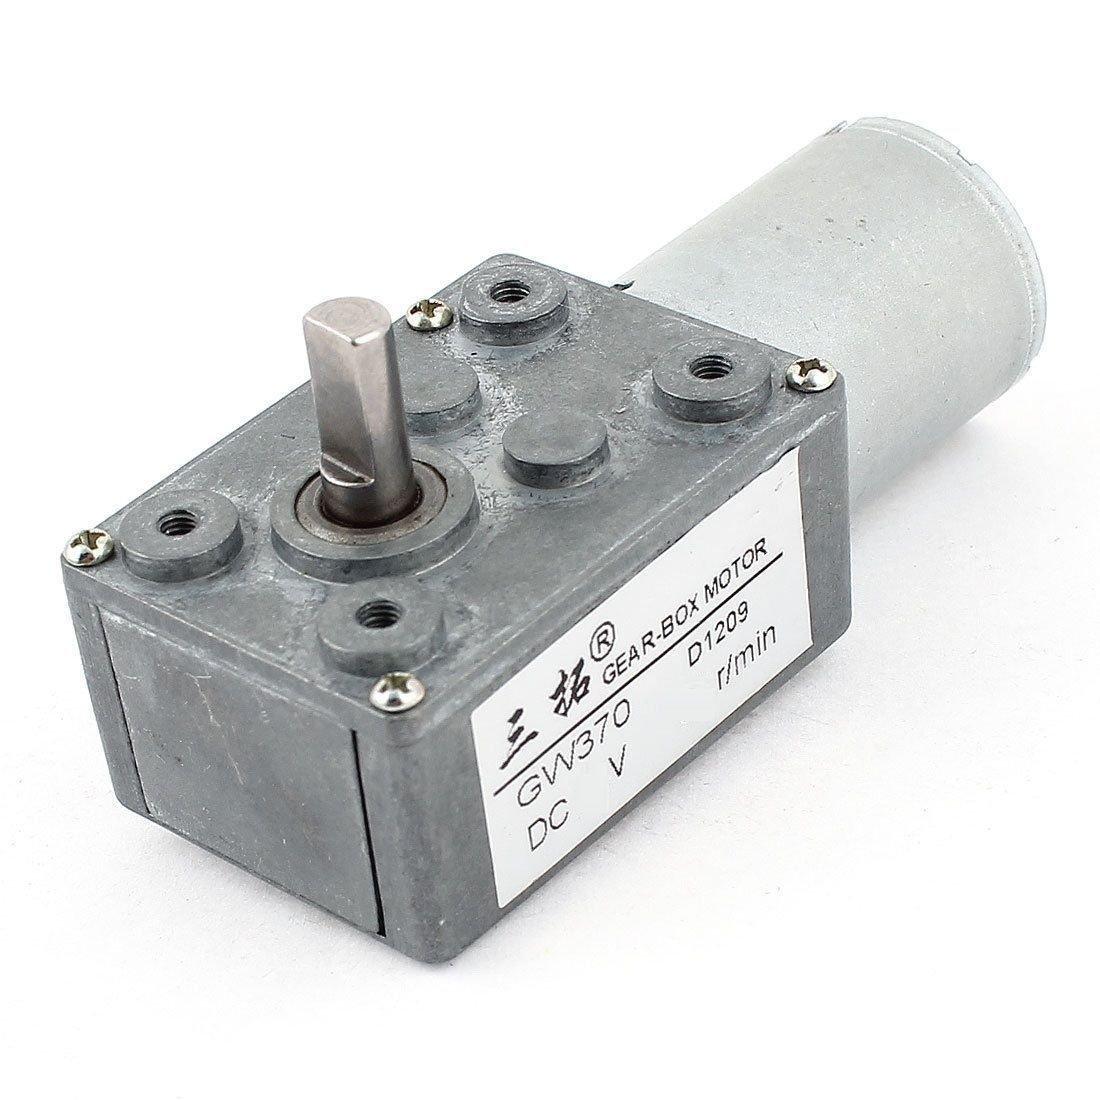 12V 24RPM 5kg.cm 0.3A Low Speed High-torque Reducer Gearbox DC Worm Gear Motor